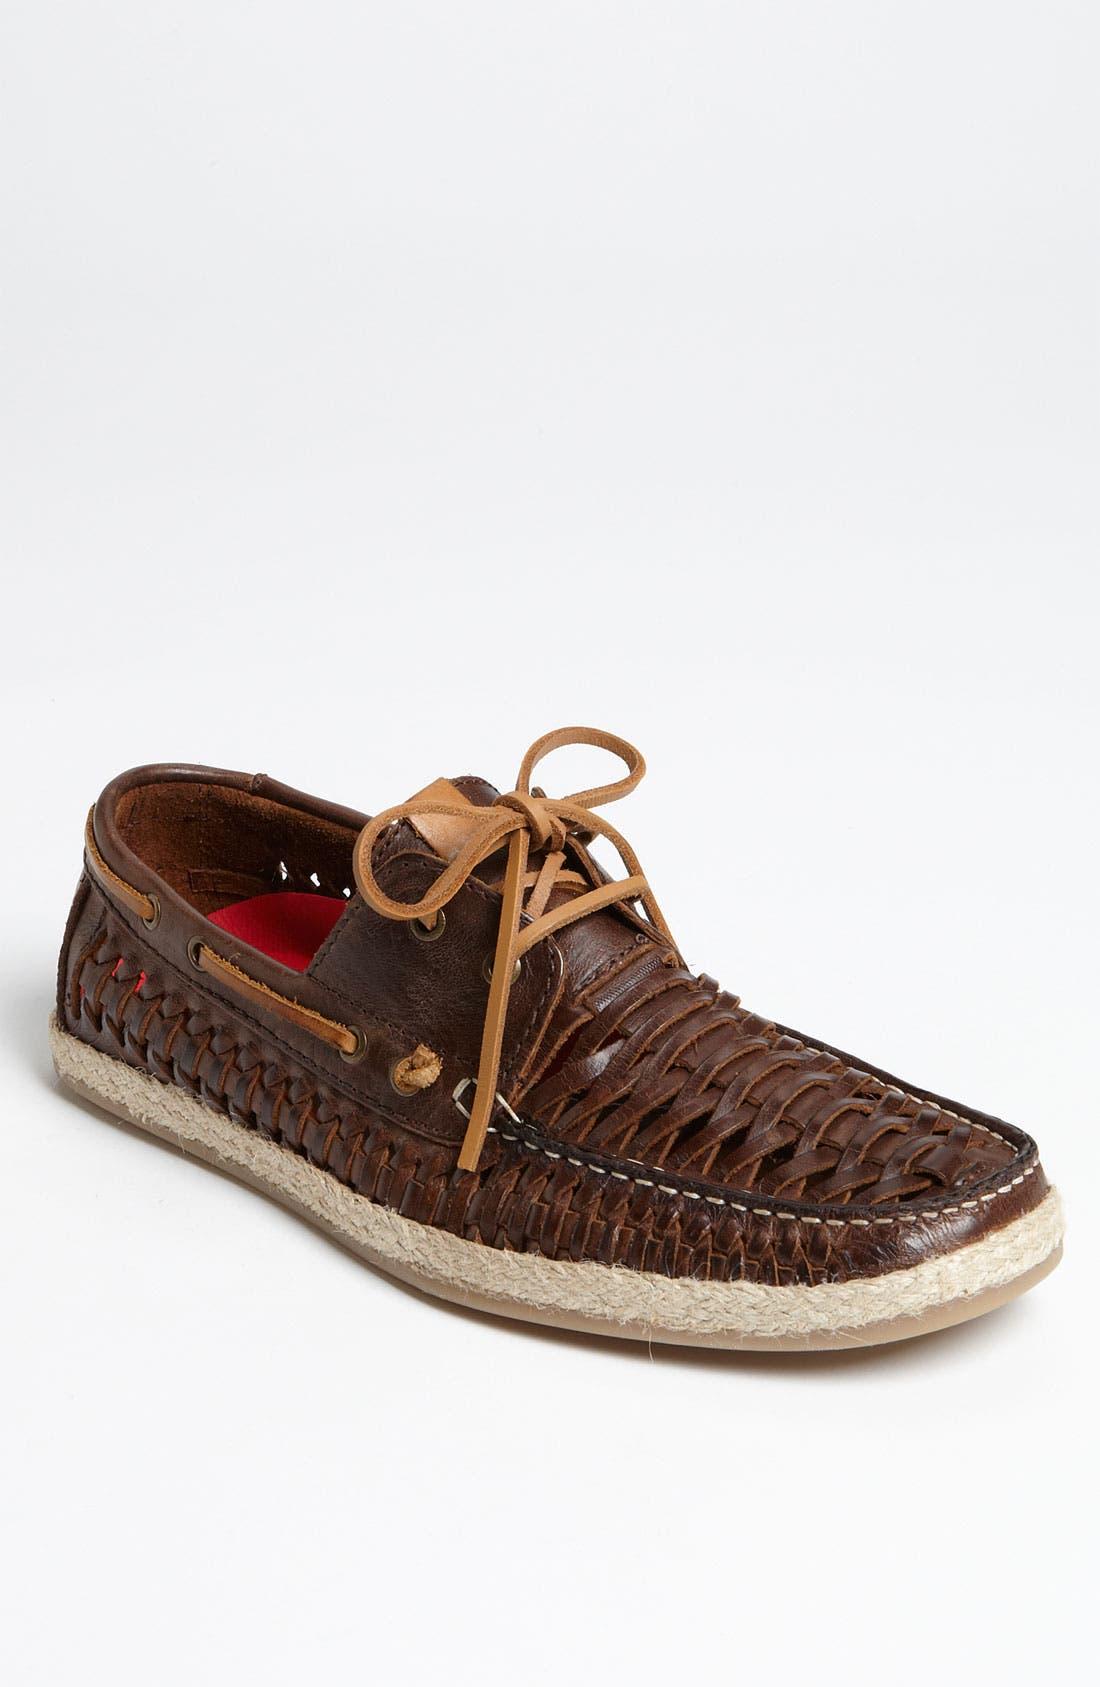 Alternate Image 1 Selected - ALDO 'Waisanen' Shoe